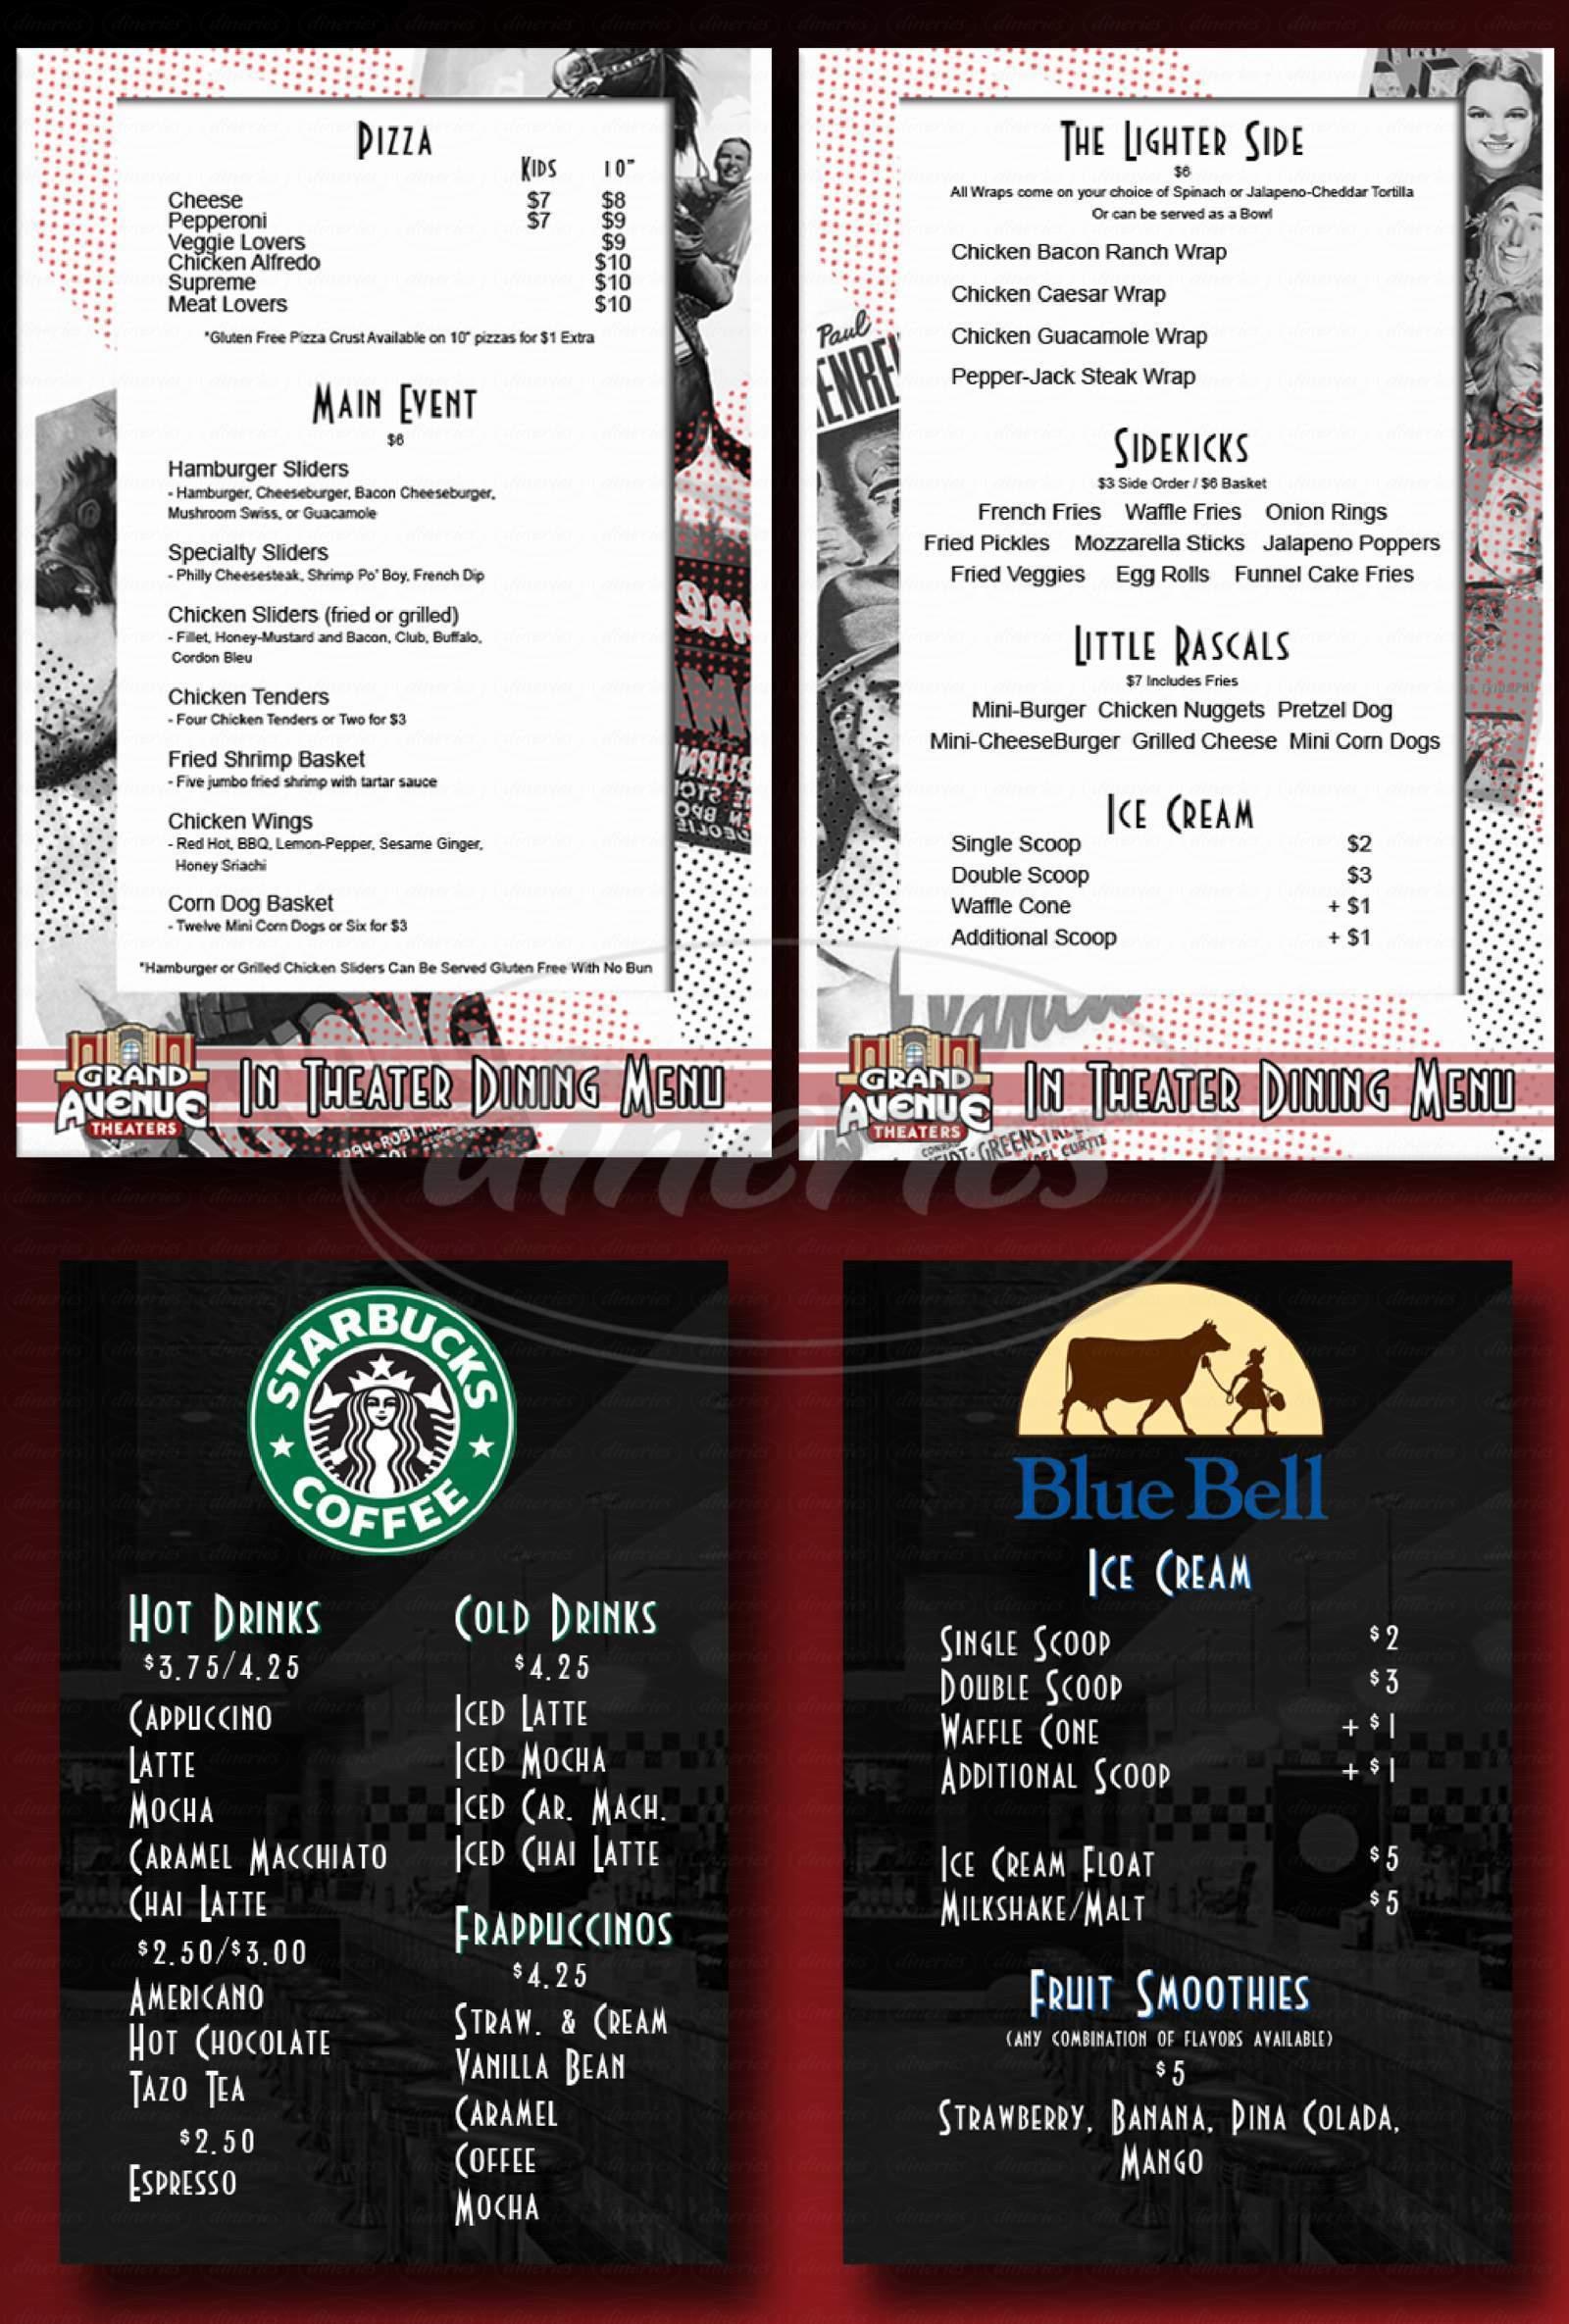 menu for Grand Avenue Theater